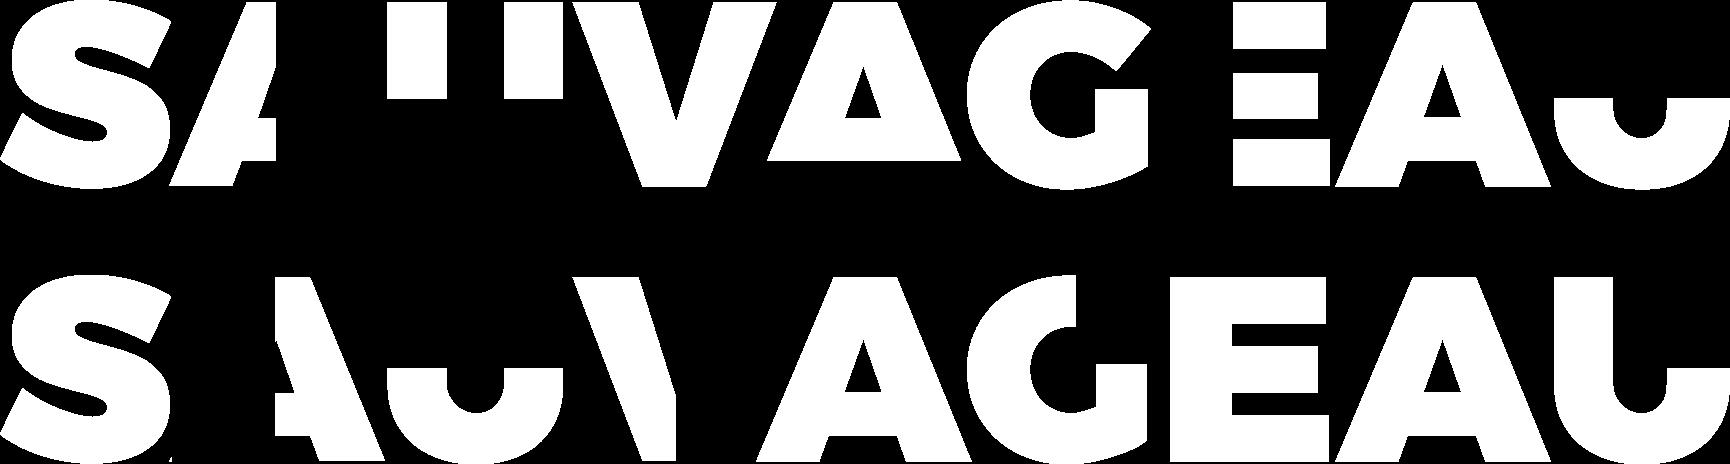 Sauvageau Sauvageau – page de la production